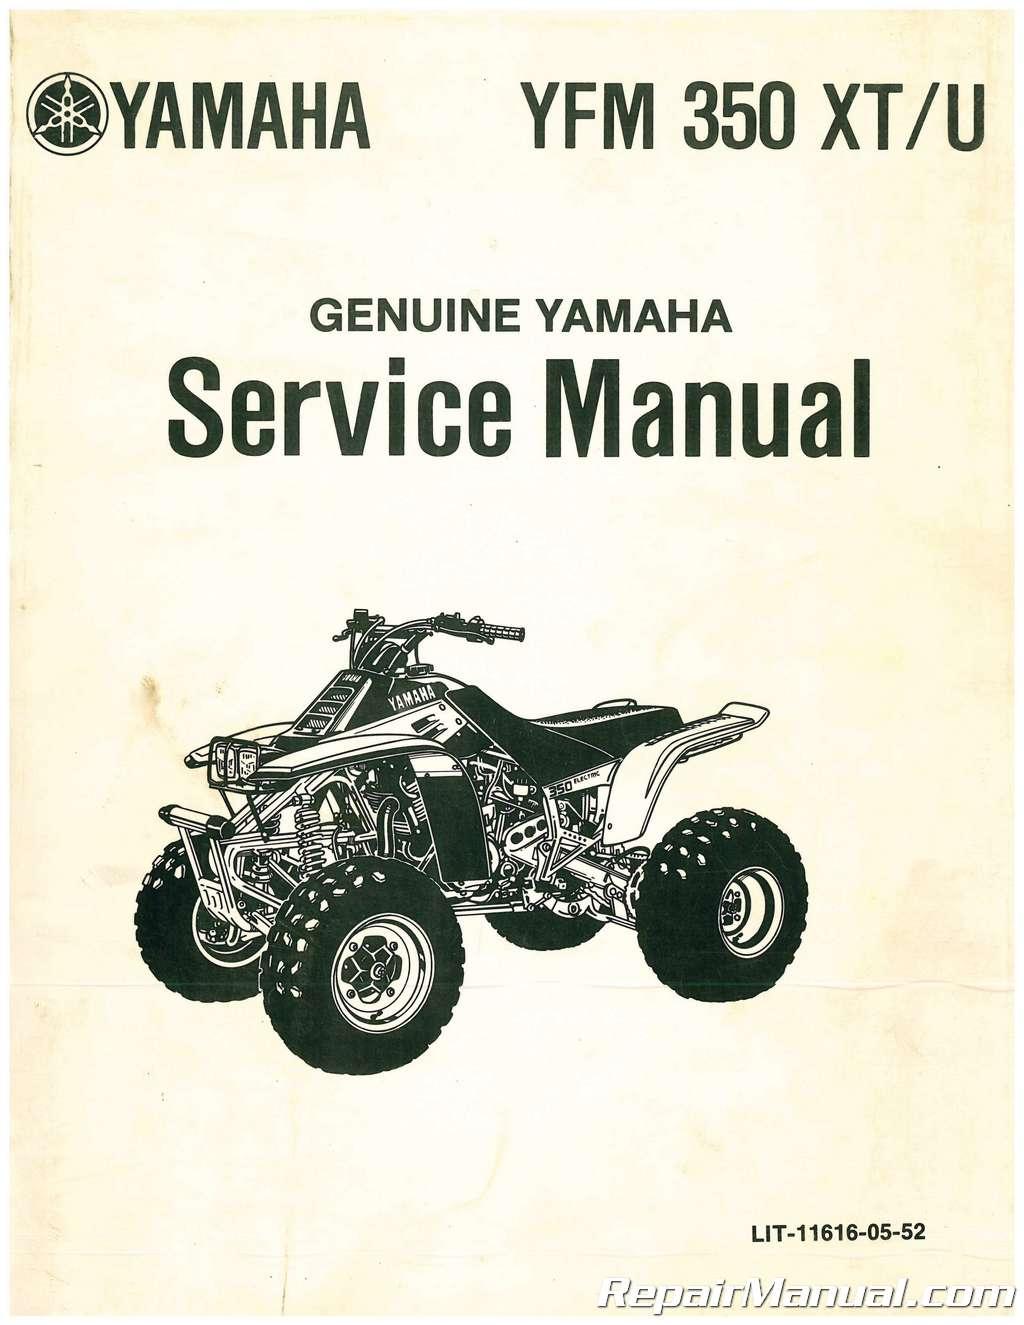 used 1986 1987 yamaha yfm350x warrior atv service manual rh repairmanual com 1988 Yamaha Warrior 350 2002 Yamaha Warrior 350